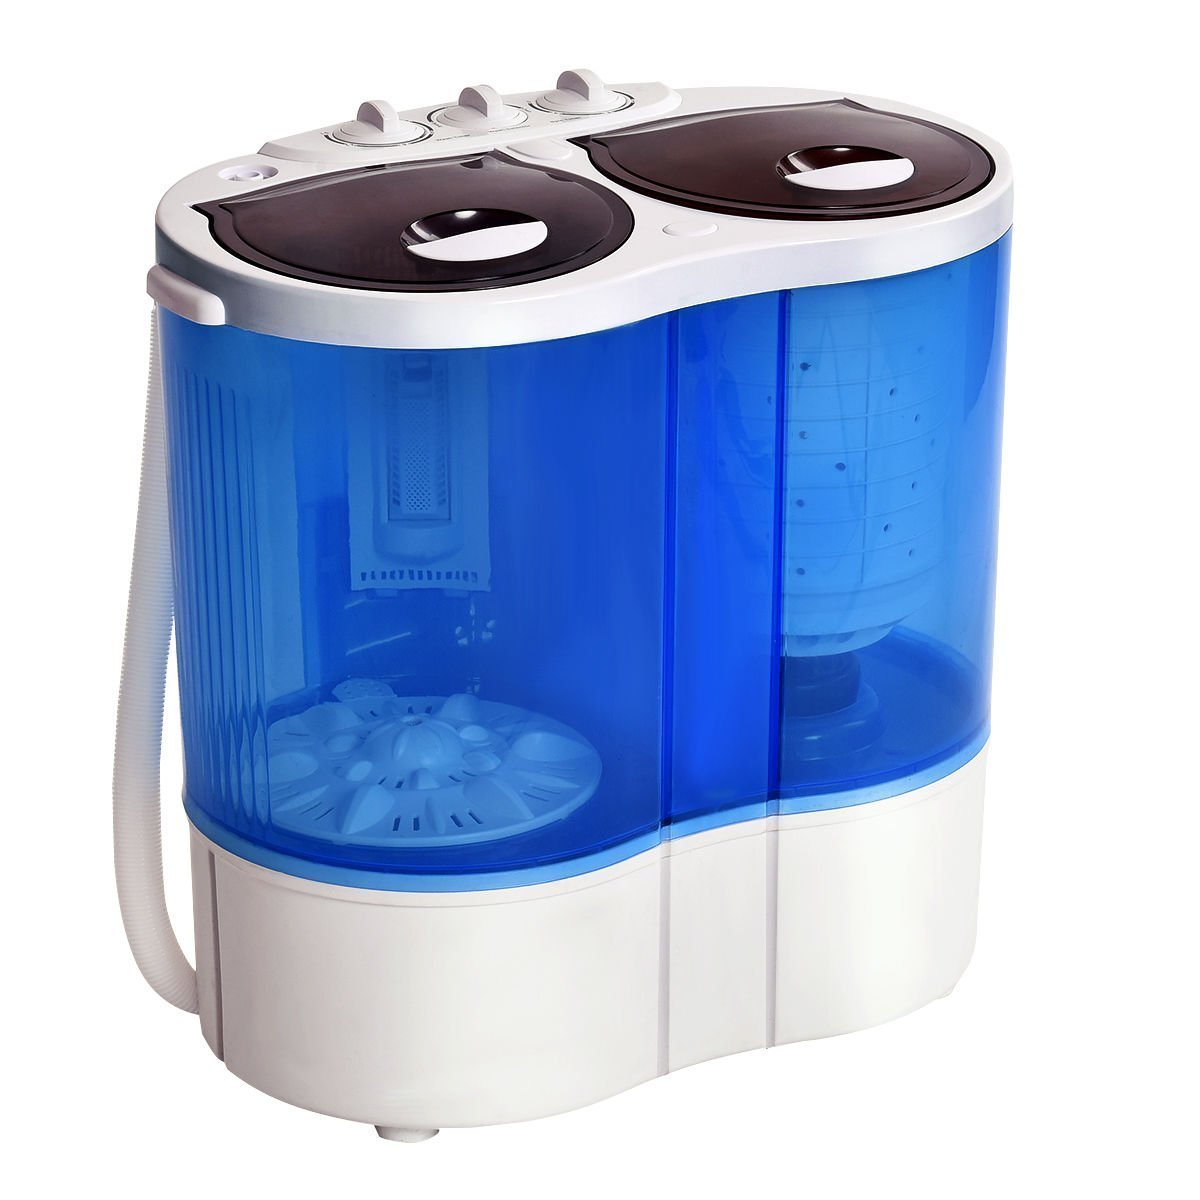 Giantex 15.4lbs Portable Mini Washing Machine